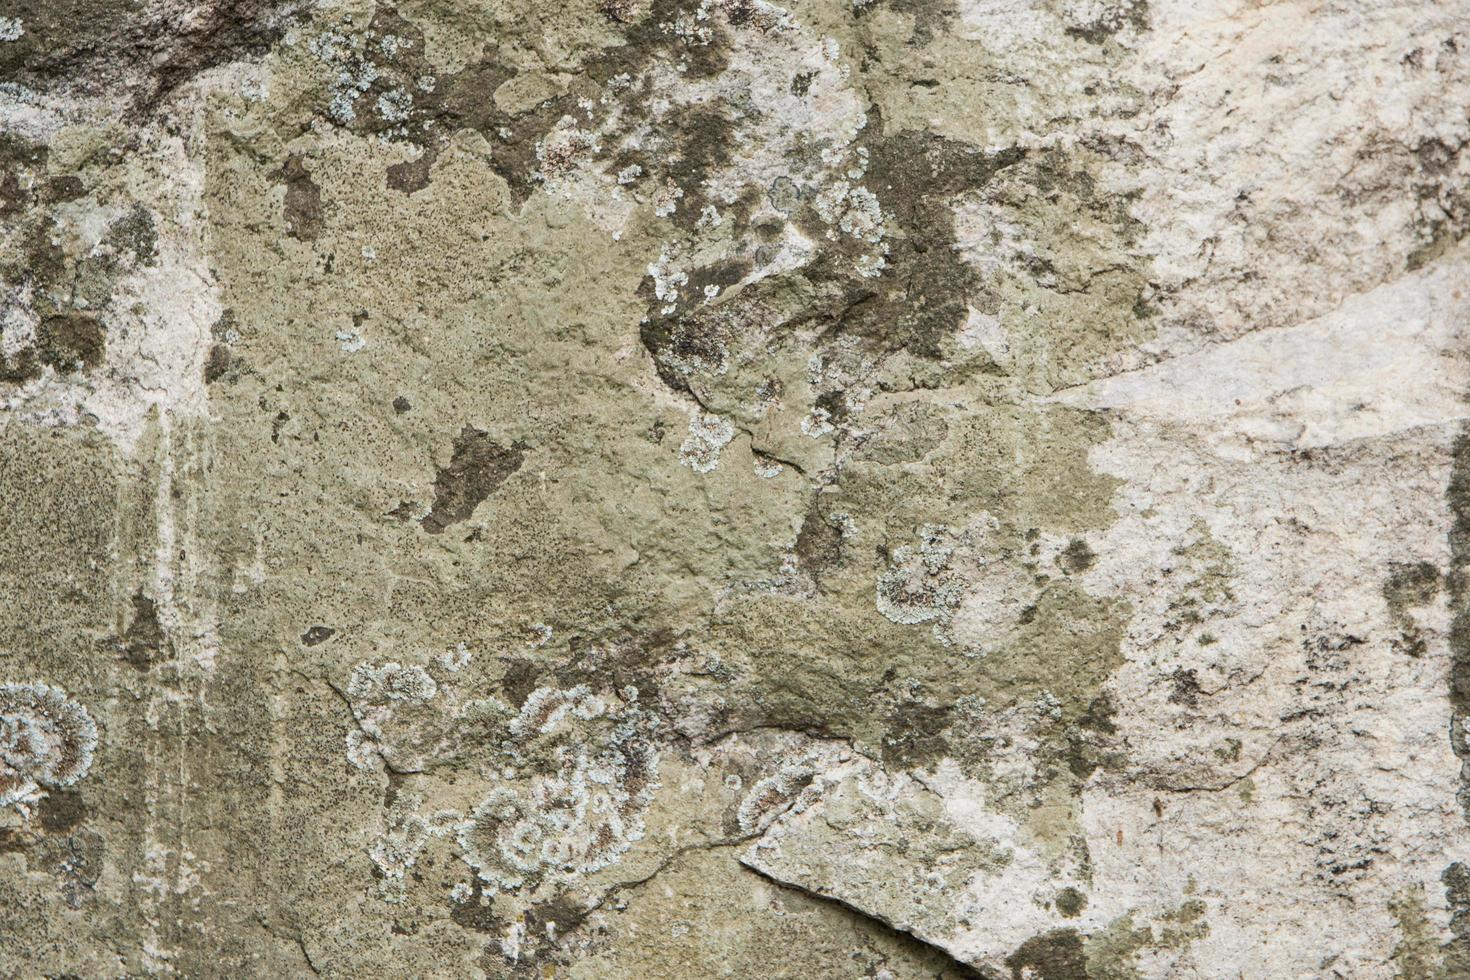 Patterned stone background photo